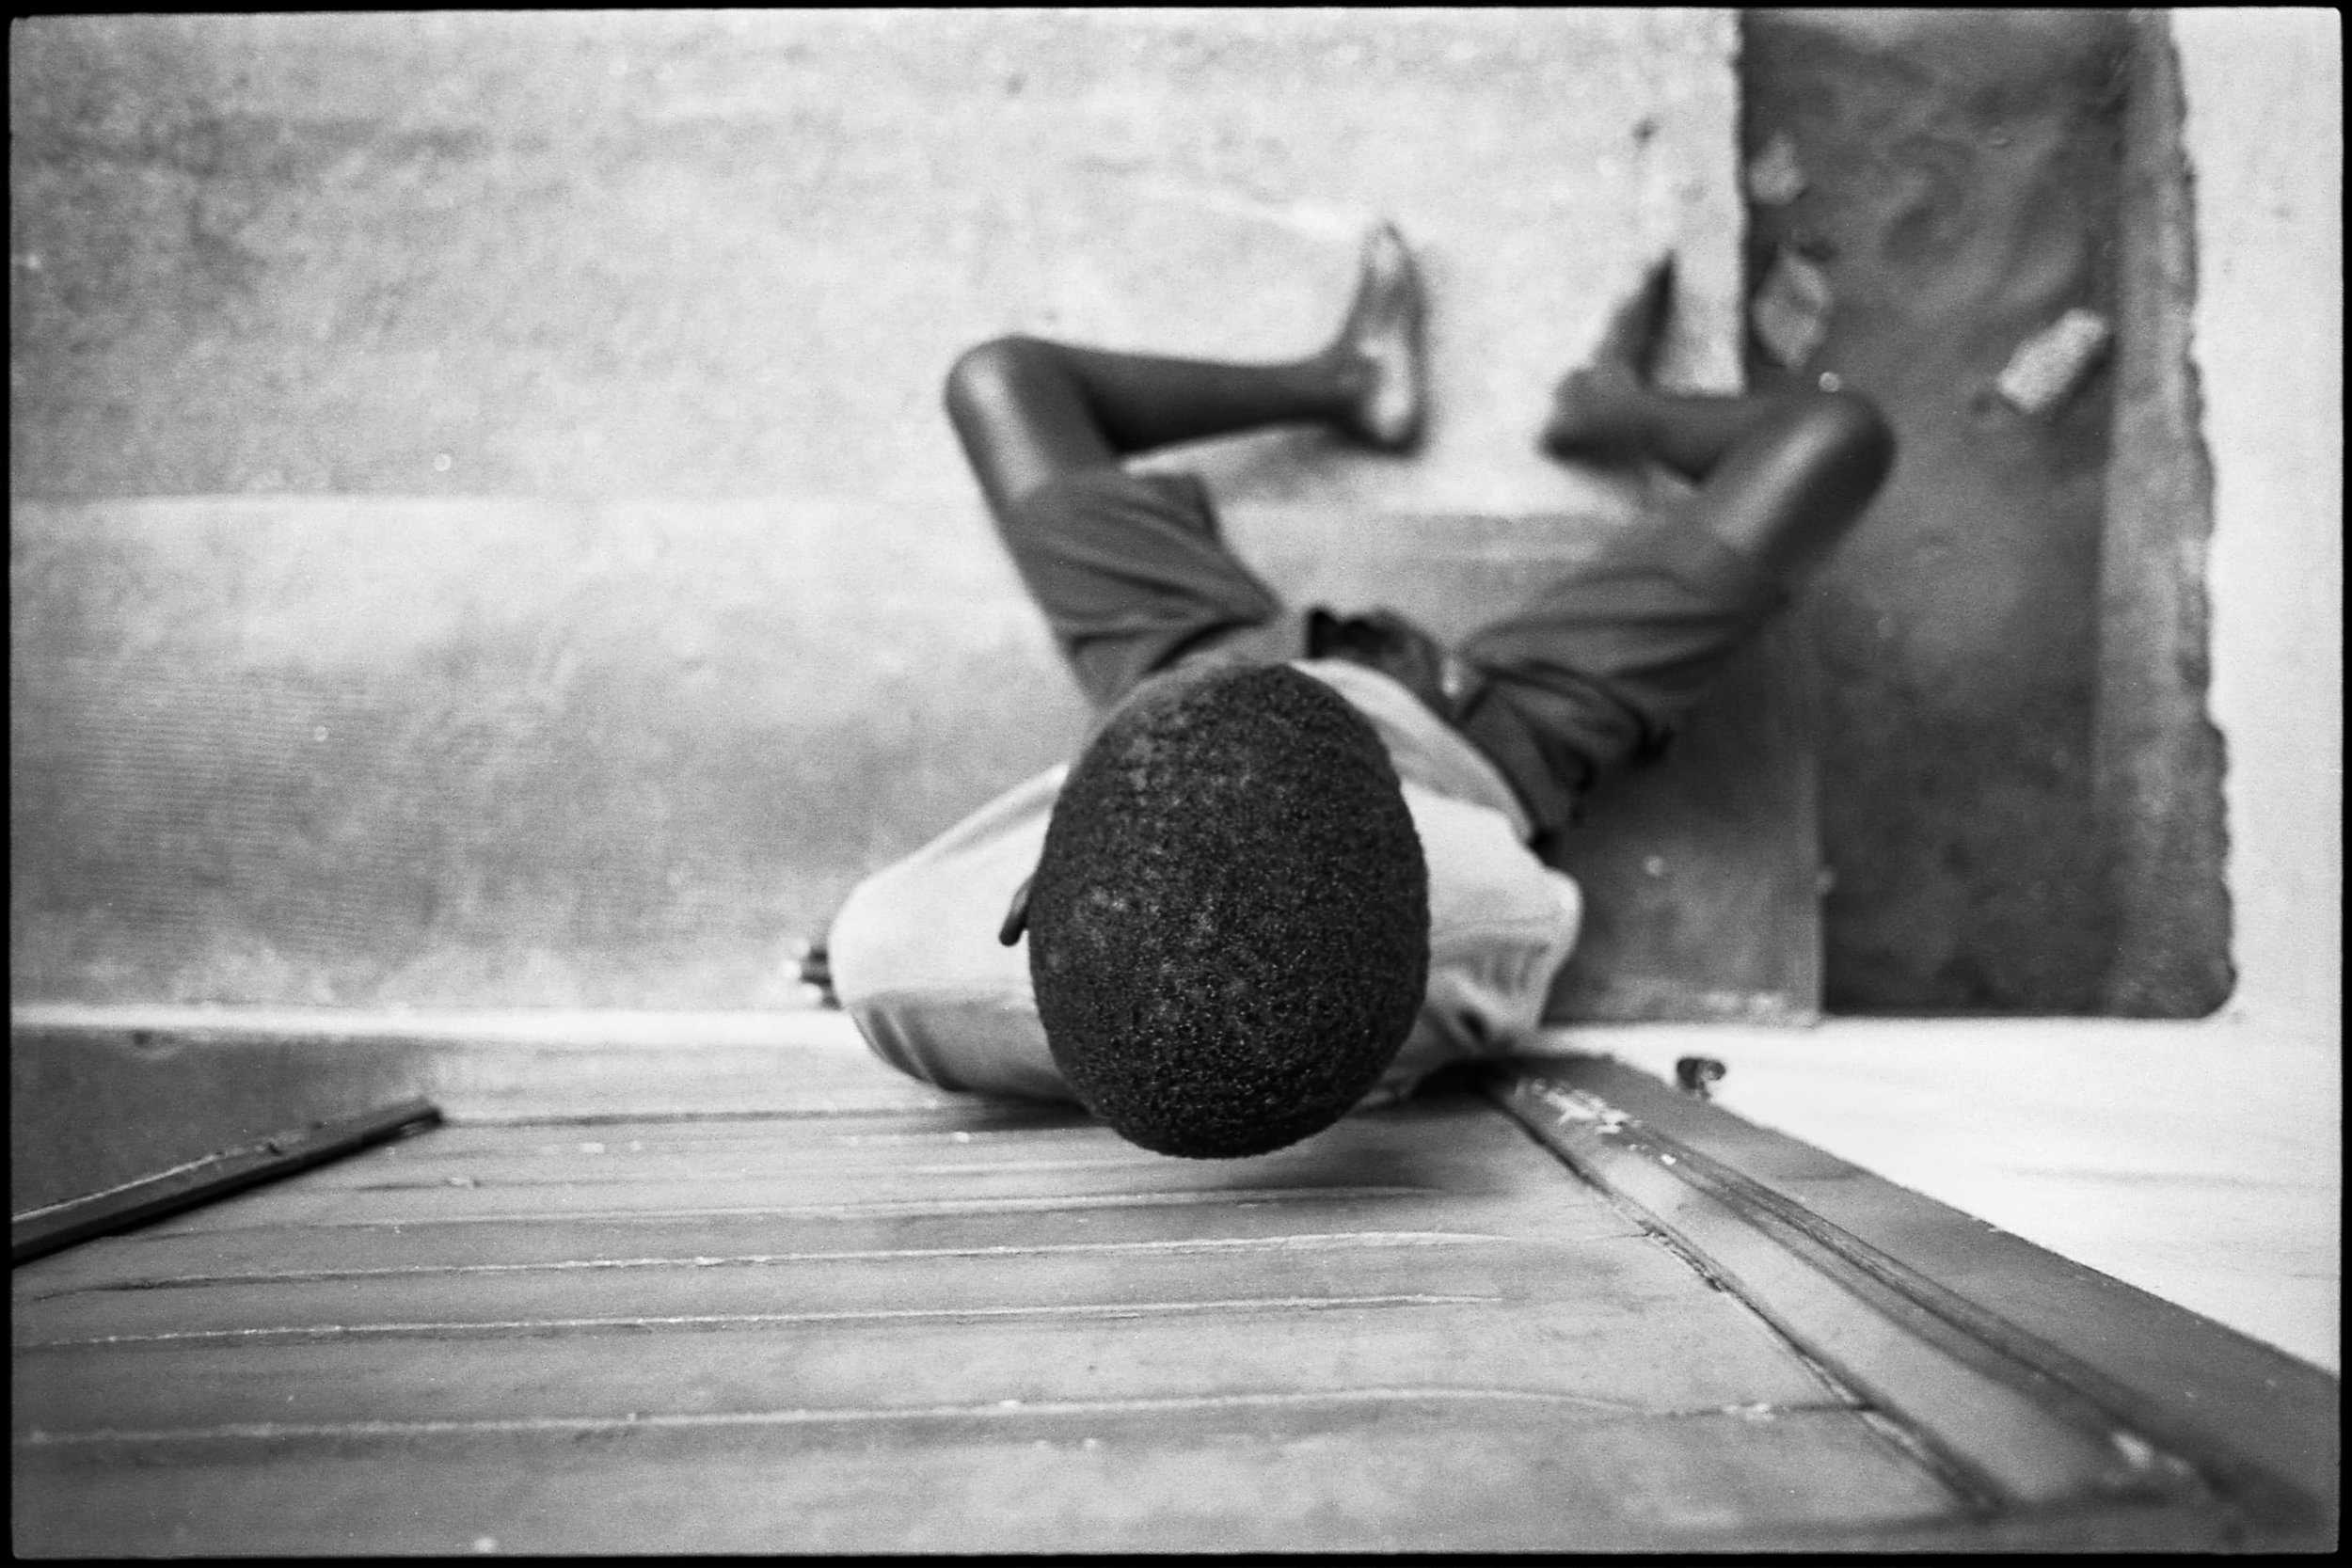 documentary-reportage-centre-les-archanges-fabio-burrelli-1.jpg